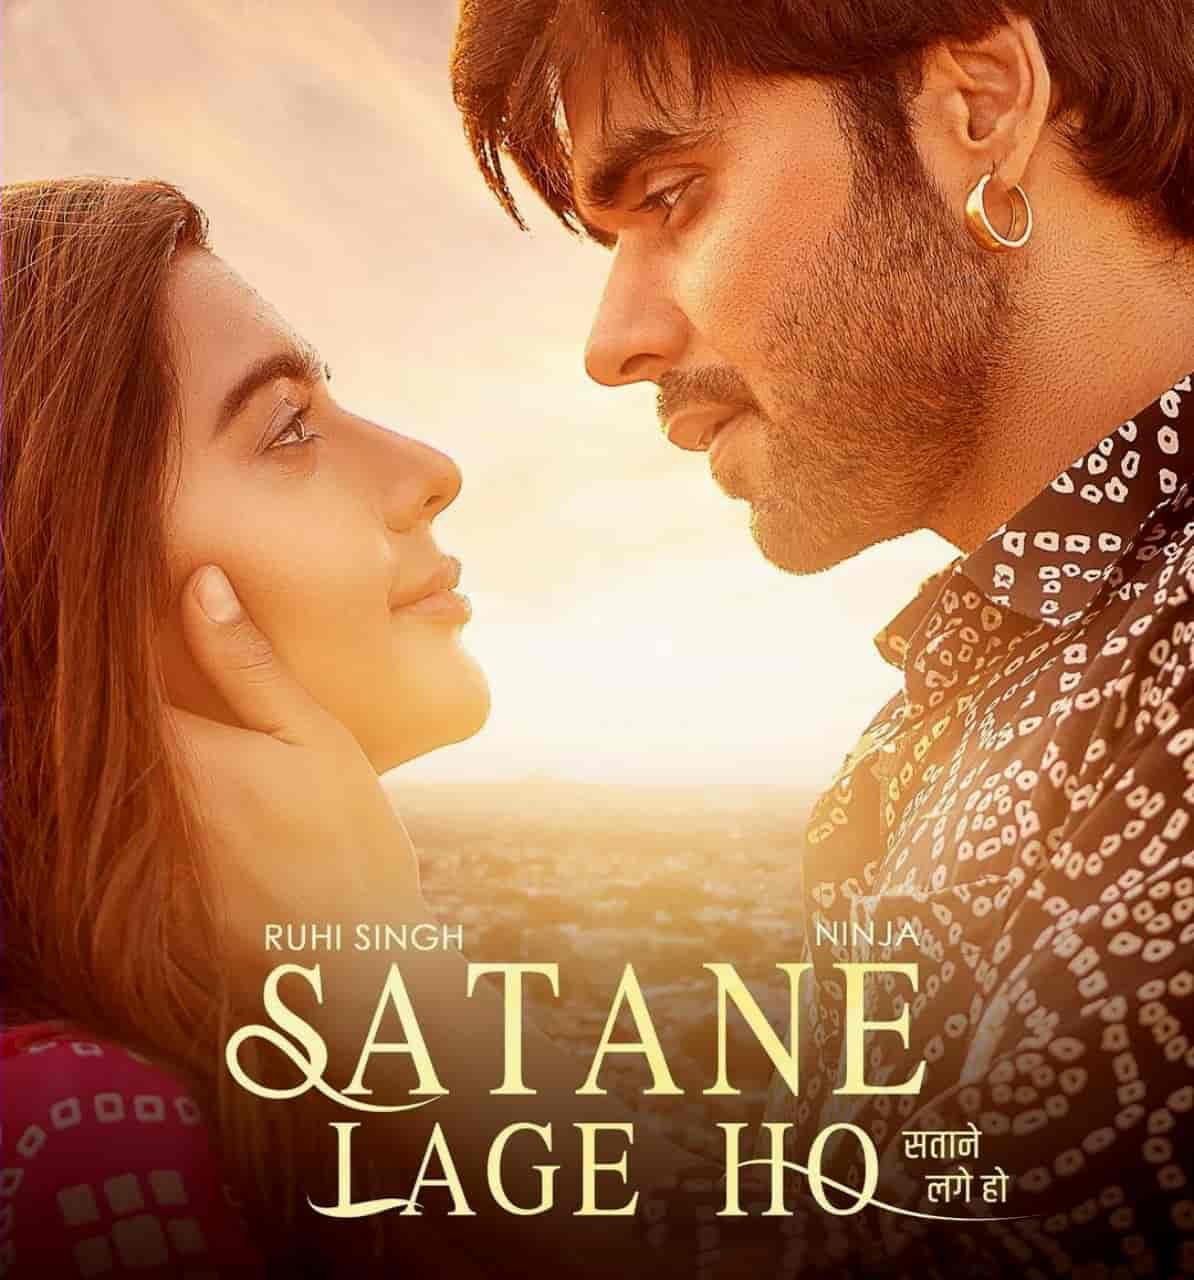 Satane Lage Ho Punjabi Song Image Features Ninja